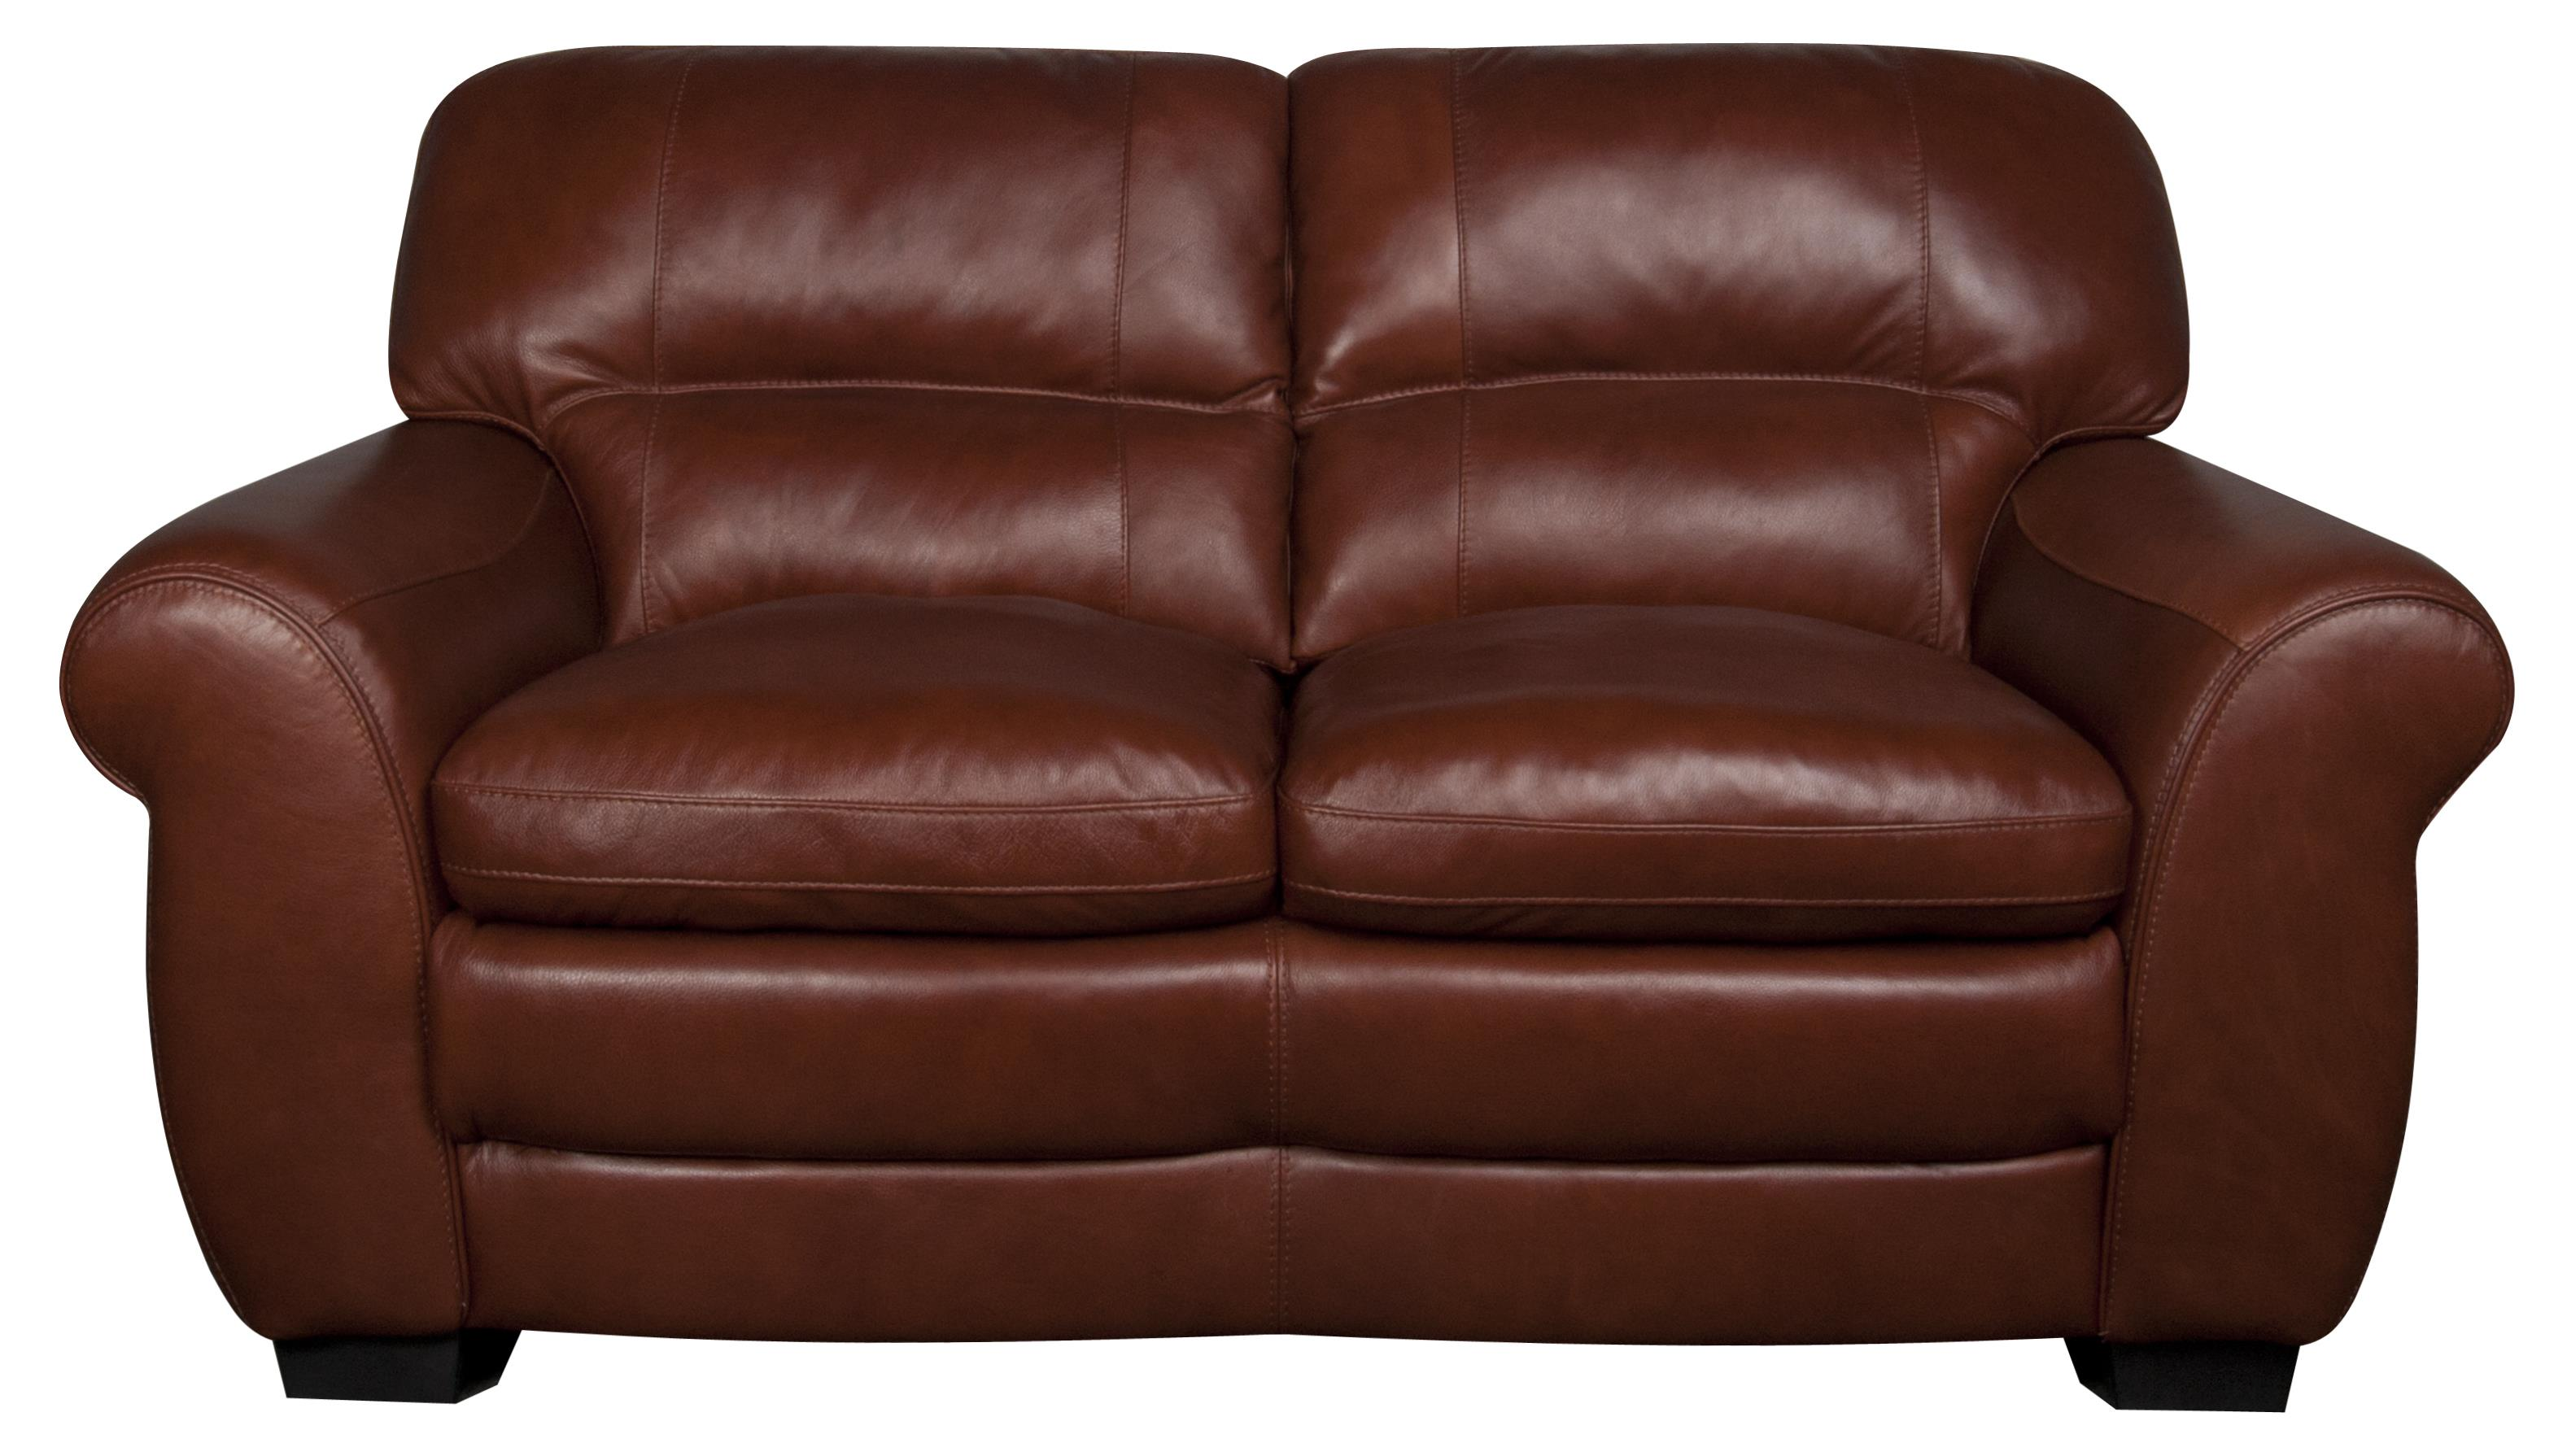 Morris Home Furnishings Ellis Ellis 100% Leather Loveseat - Item Number: 636800647